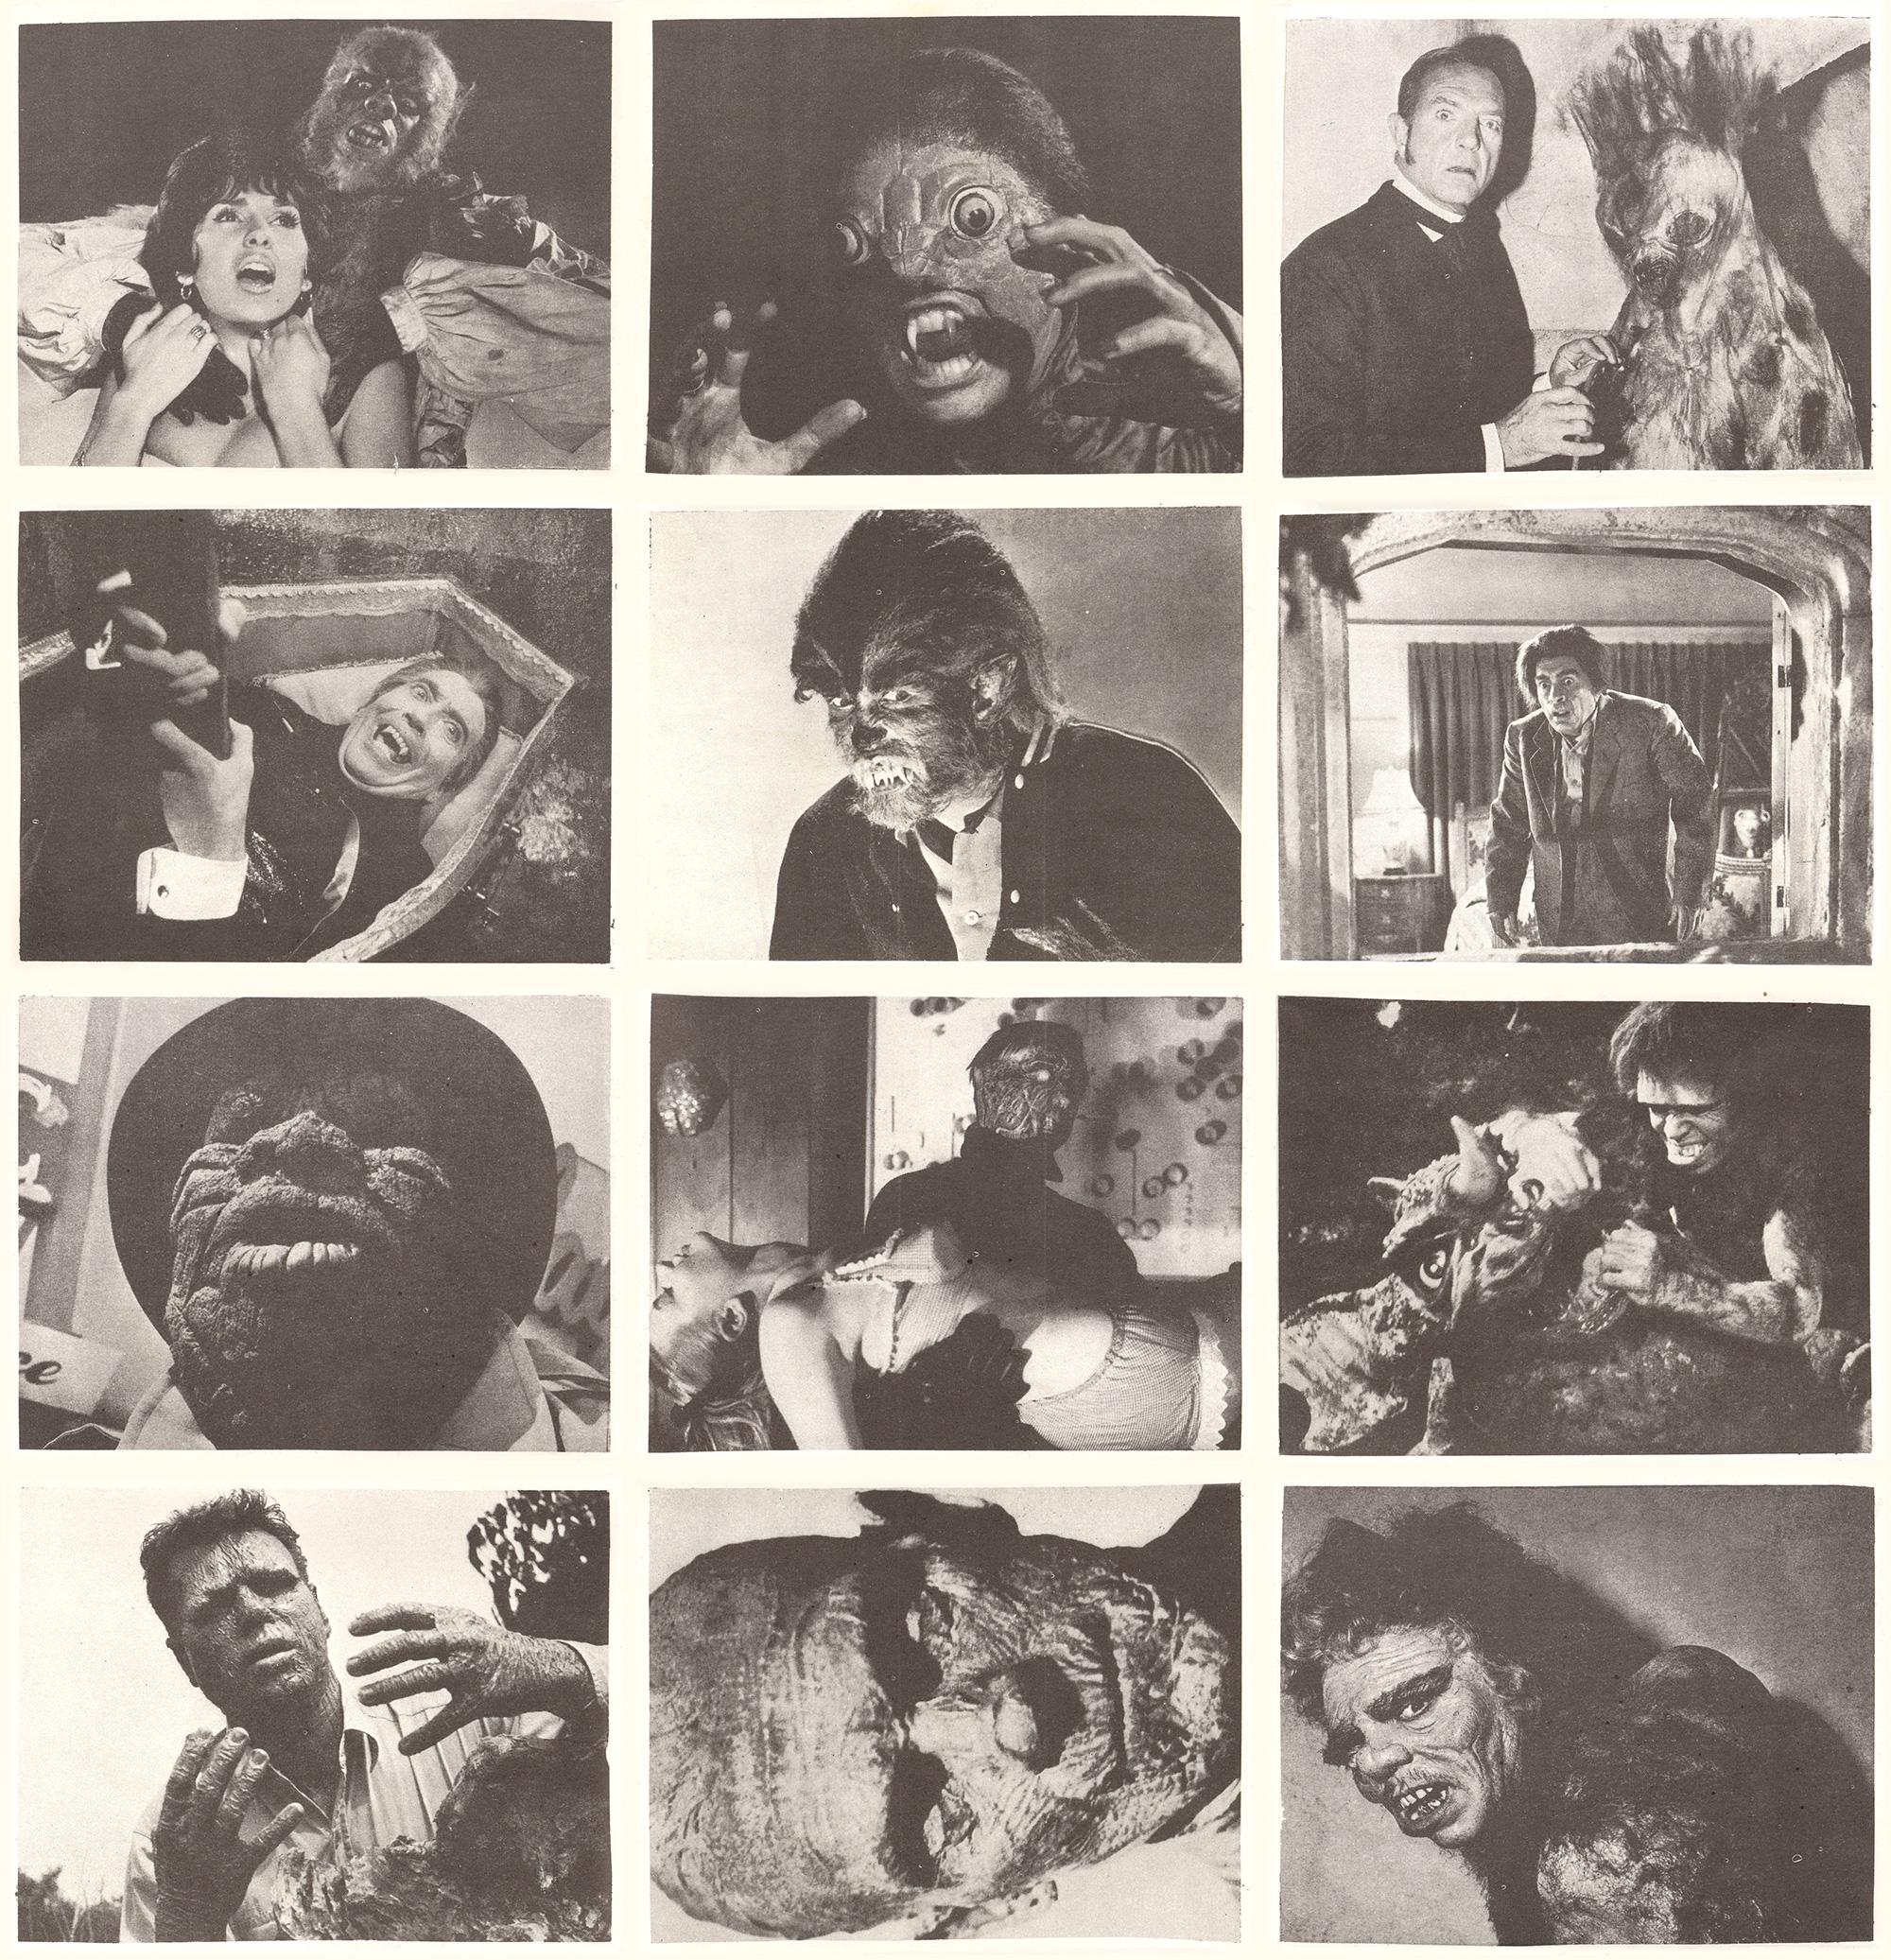 Monster Club Photos